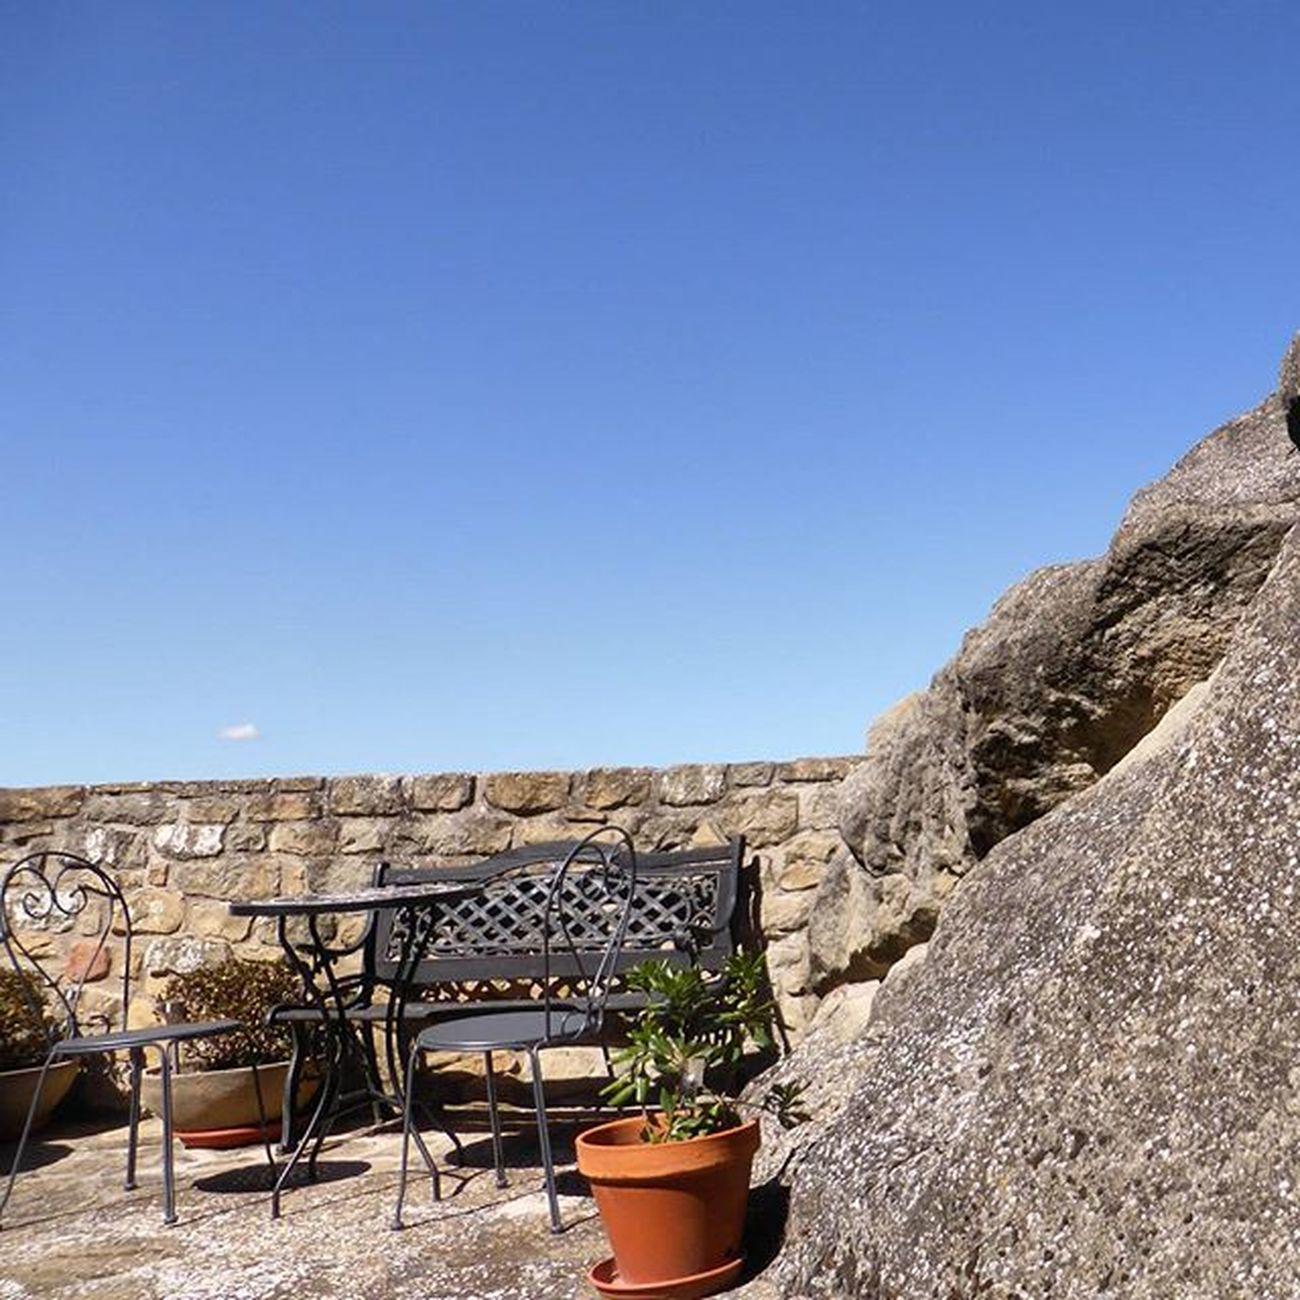 A la fresca Casadelinfanzon Sosdelreycatolico Skylovers Travel turismo igerszgz igersaragon Civitur YovisitoCincoVillas